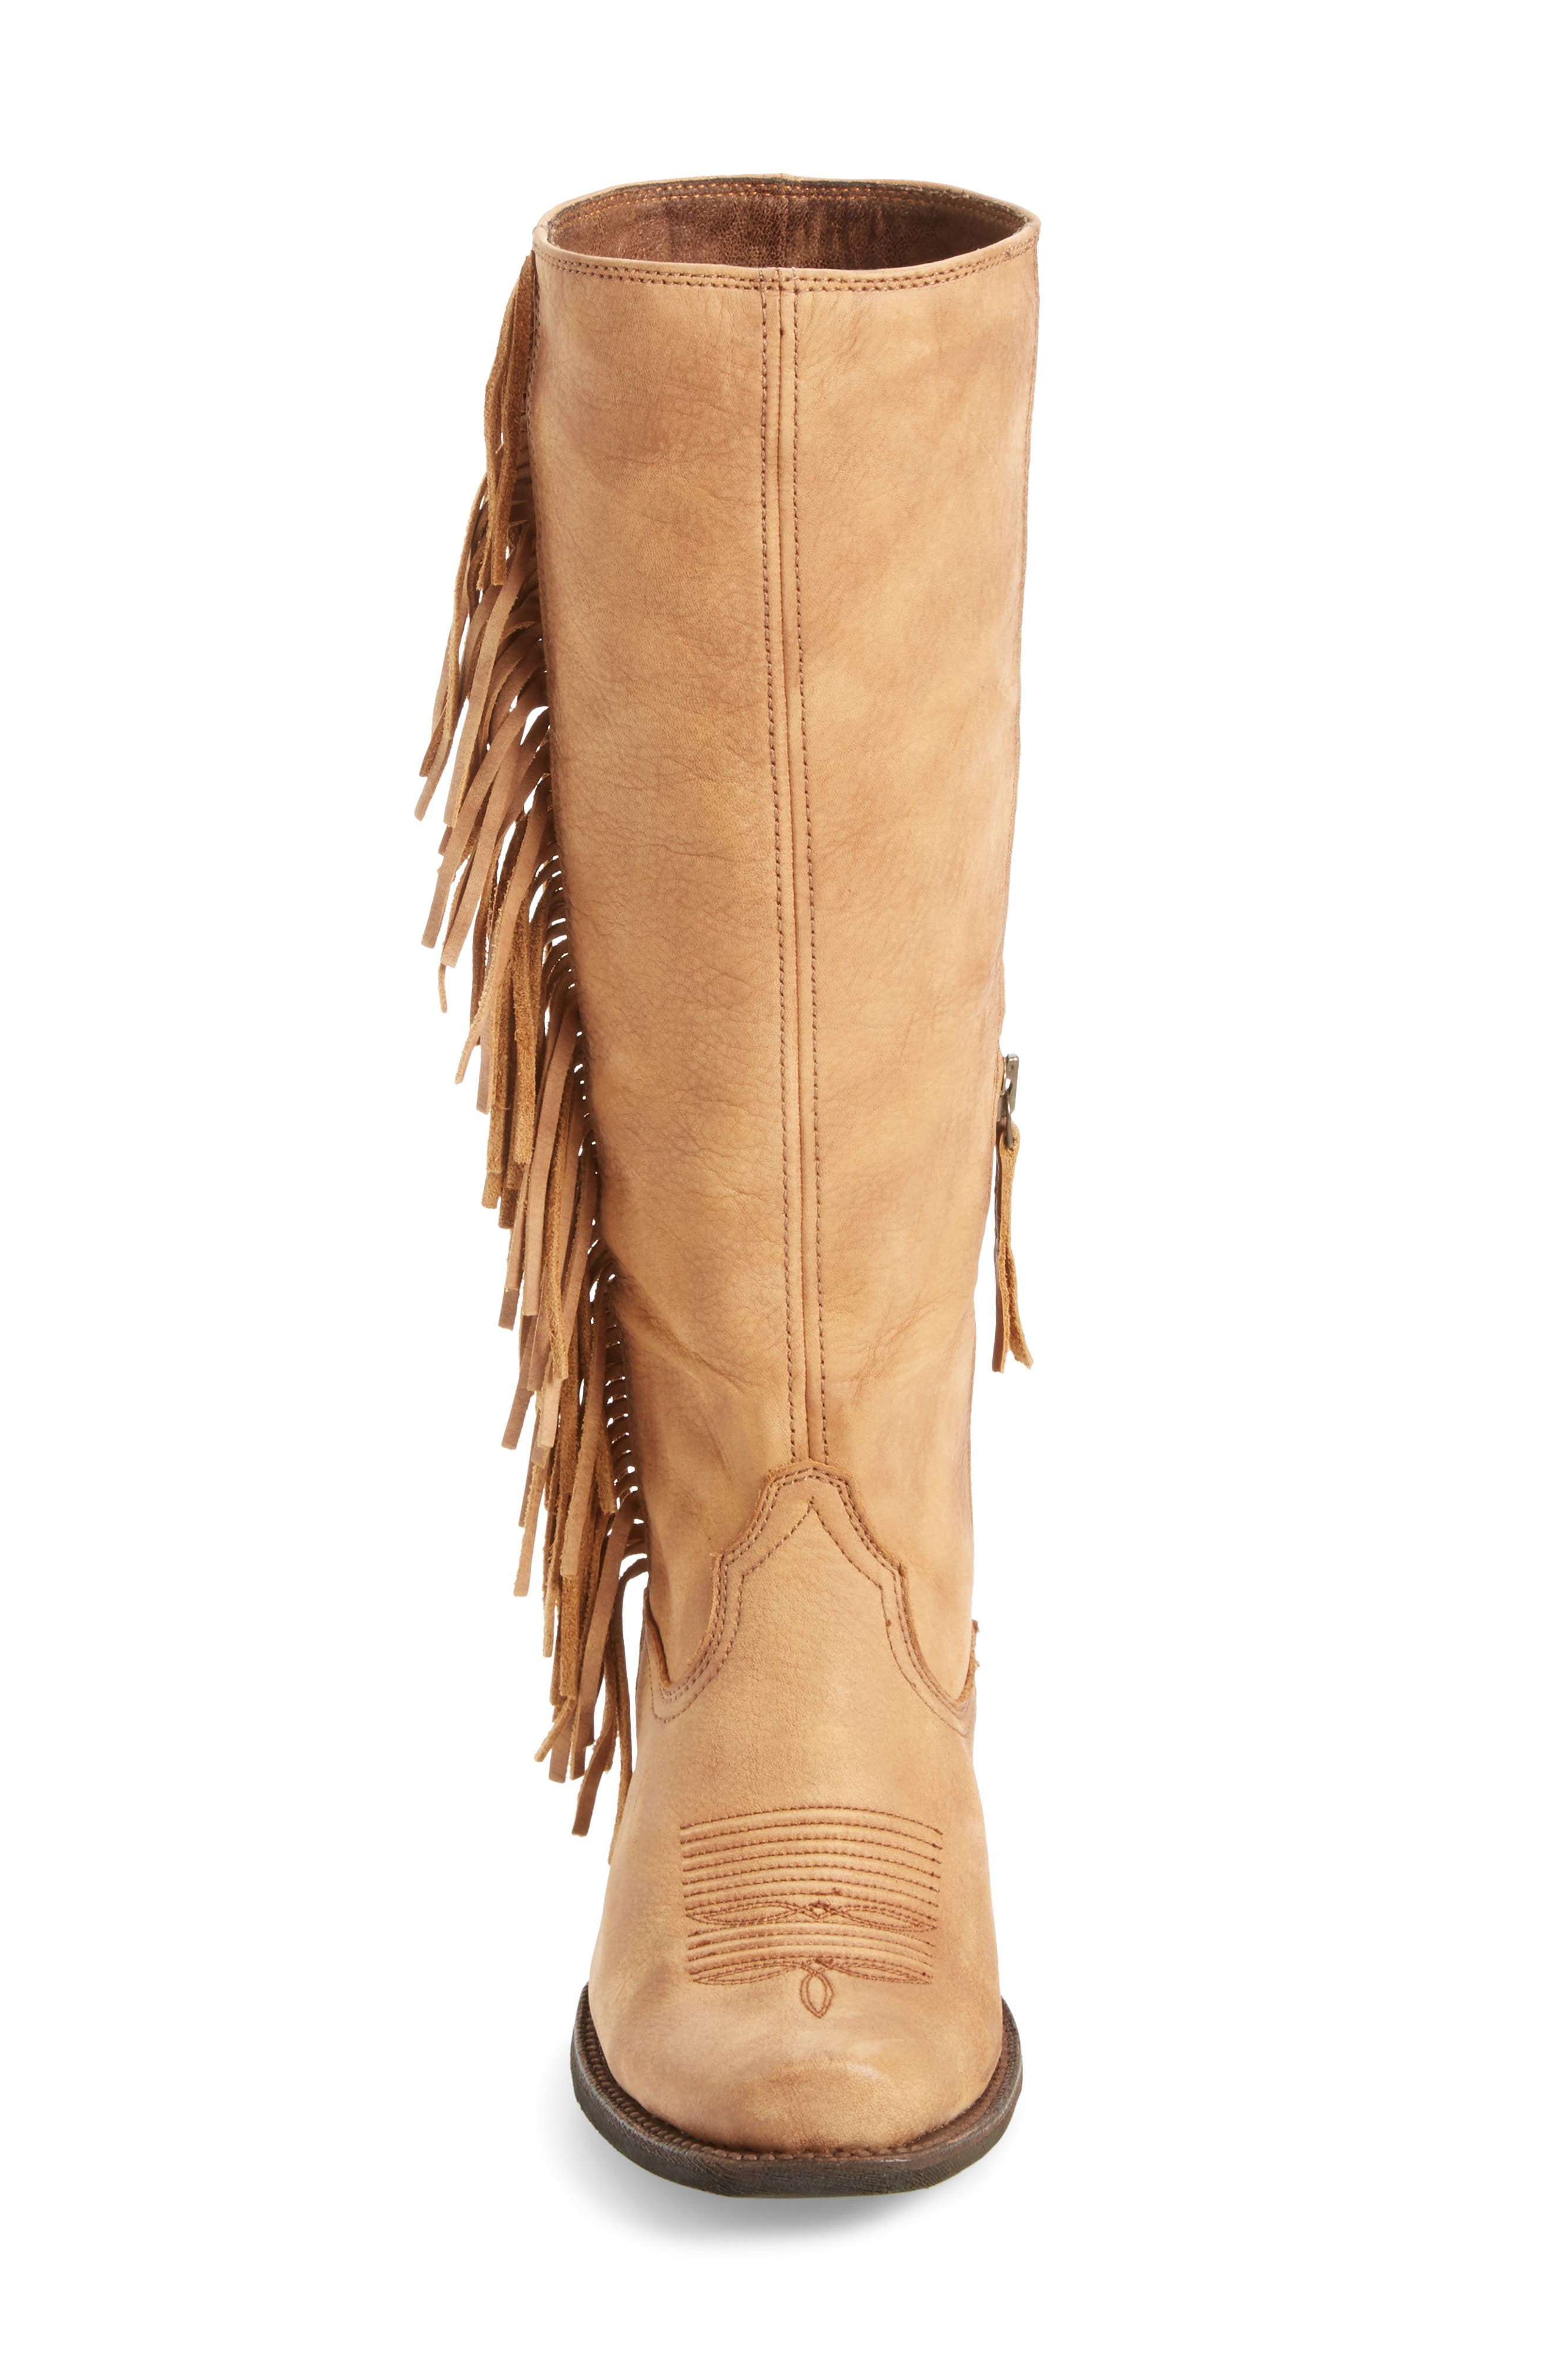 Leyton Fringe Western Boot,                             Alternate thumbnail 4, color,                             Tack Room Honey Leather